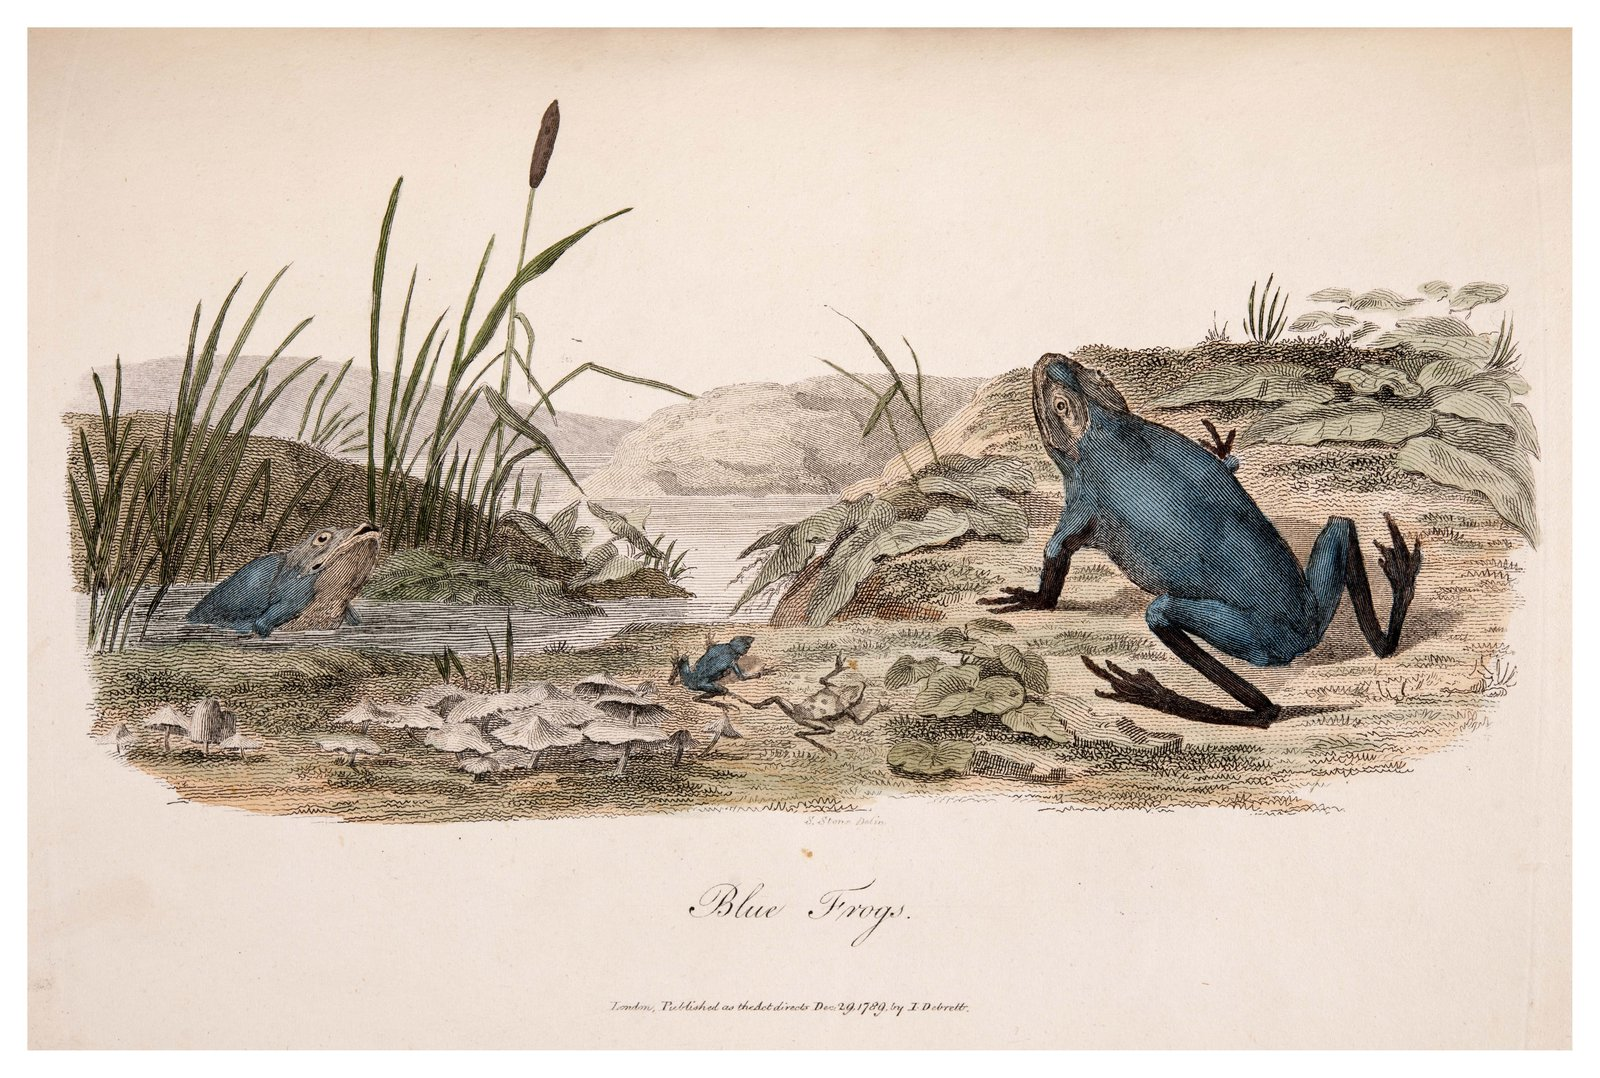 Blue Frog illustration by Sarah Stone